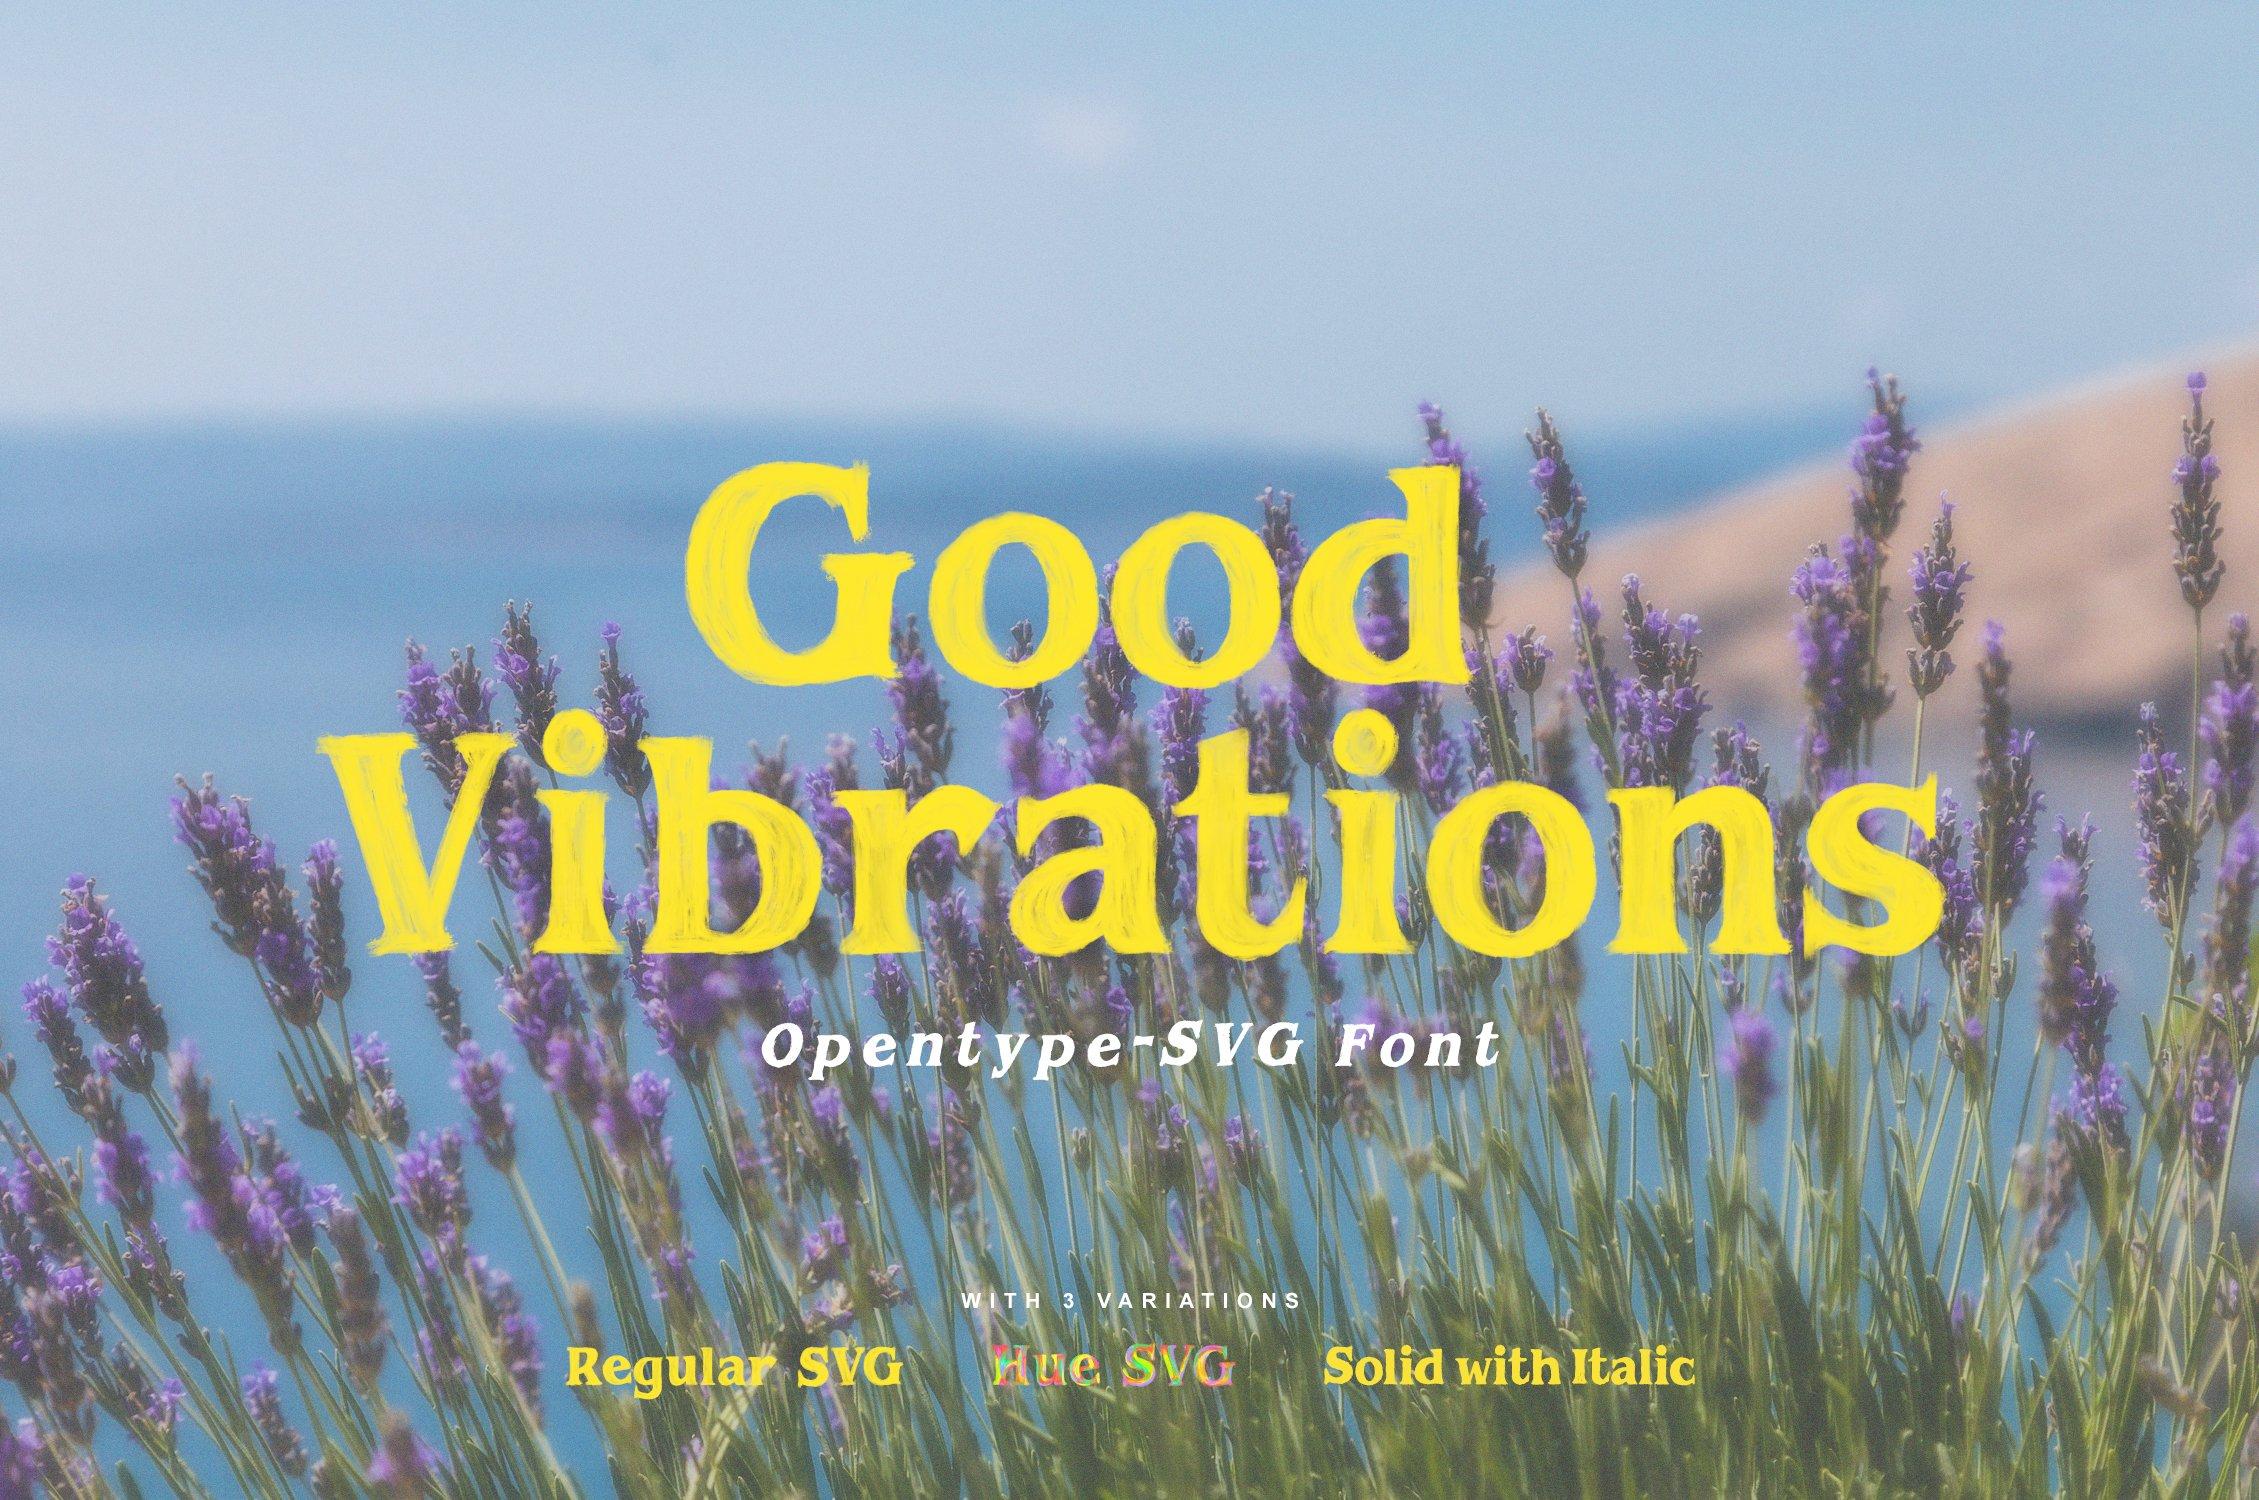 good vibrations cover 2 2